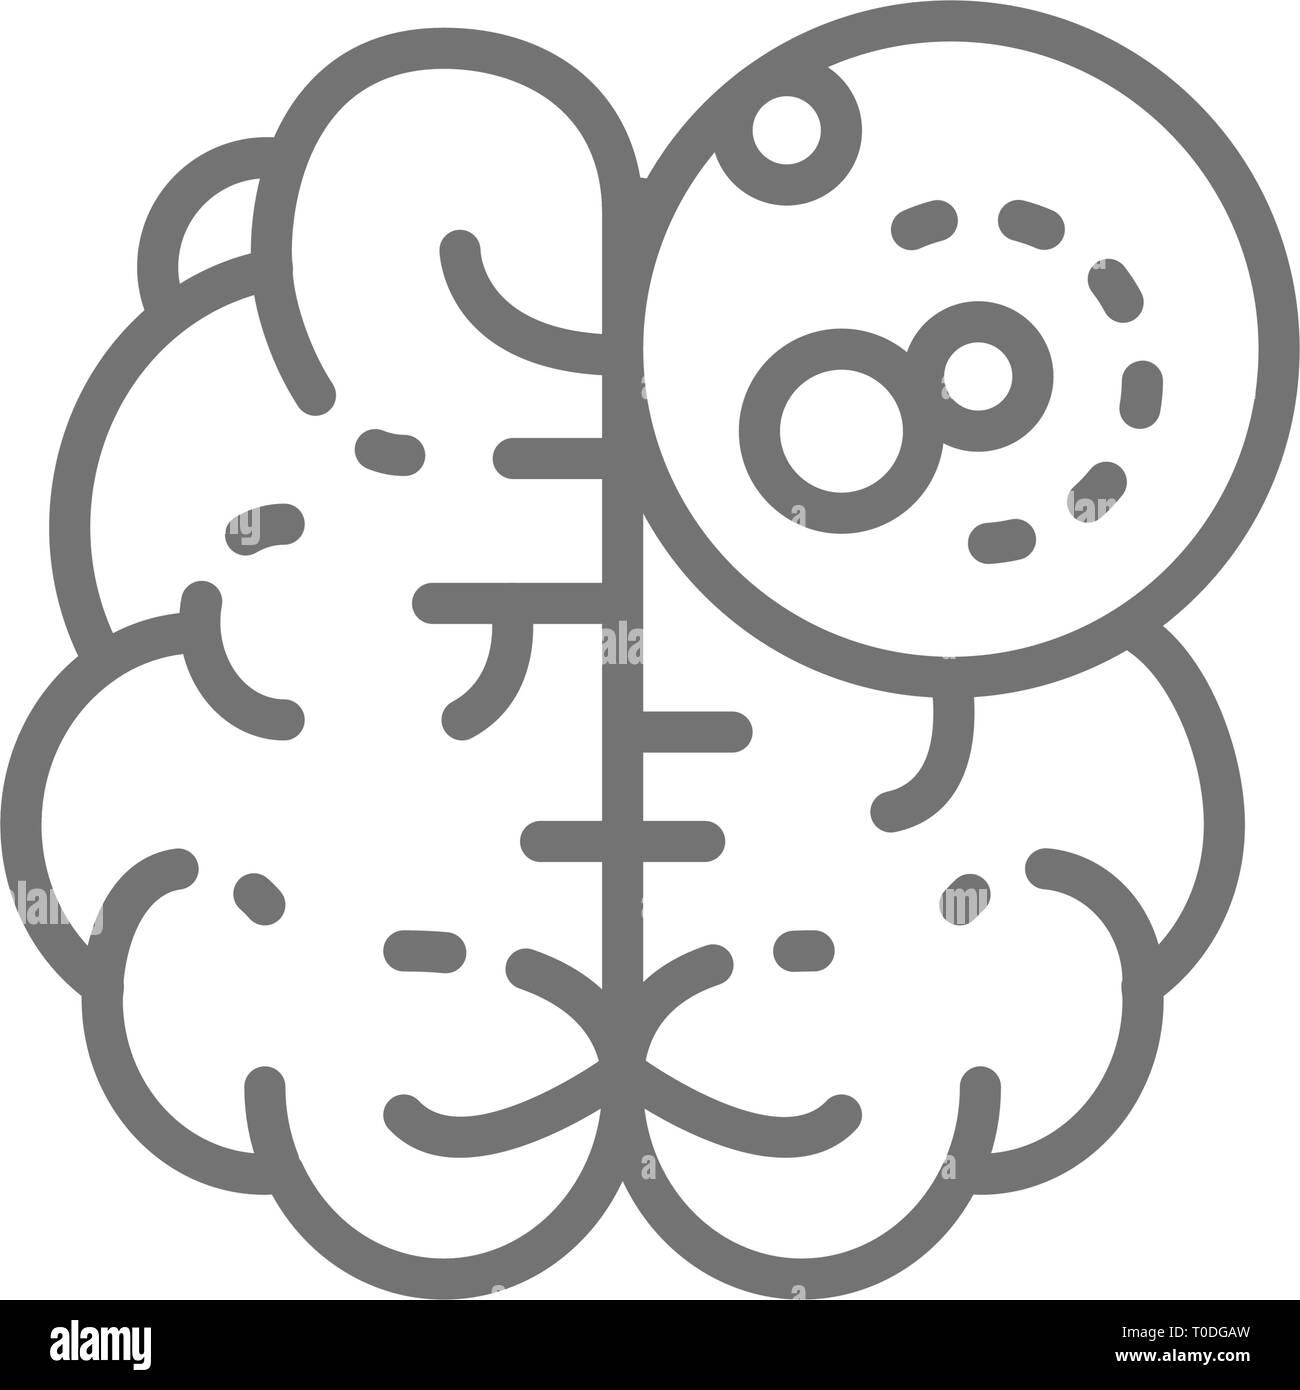 Brain cancer, malignant tumor, oncology line icon. - Stock Image